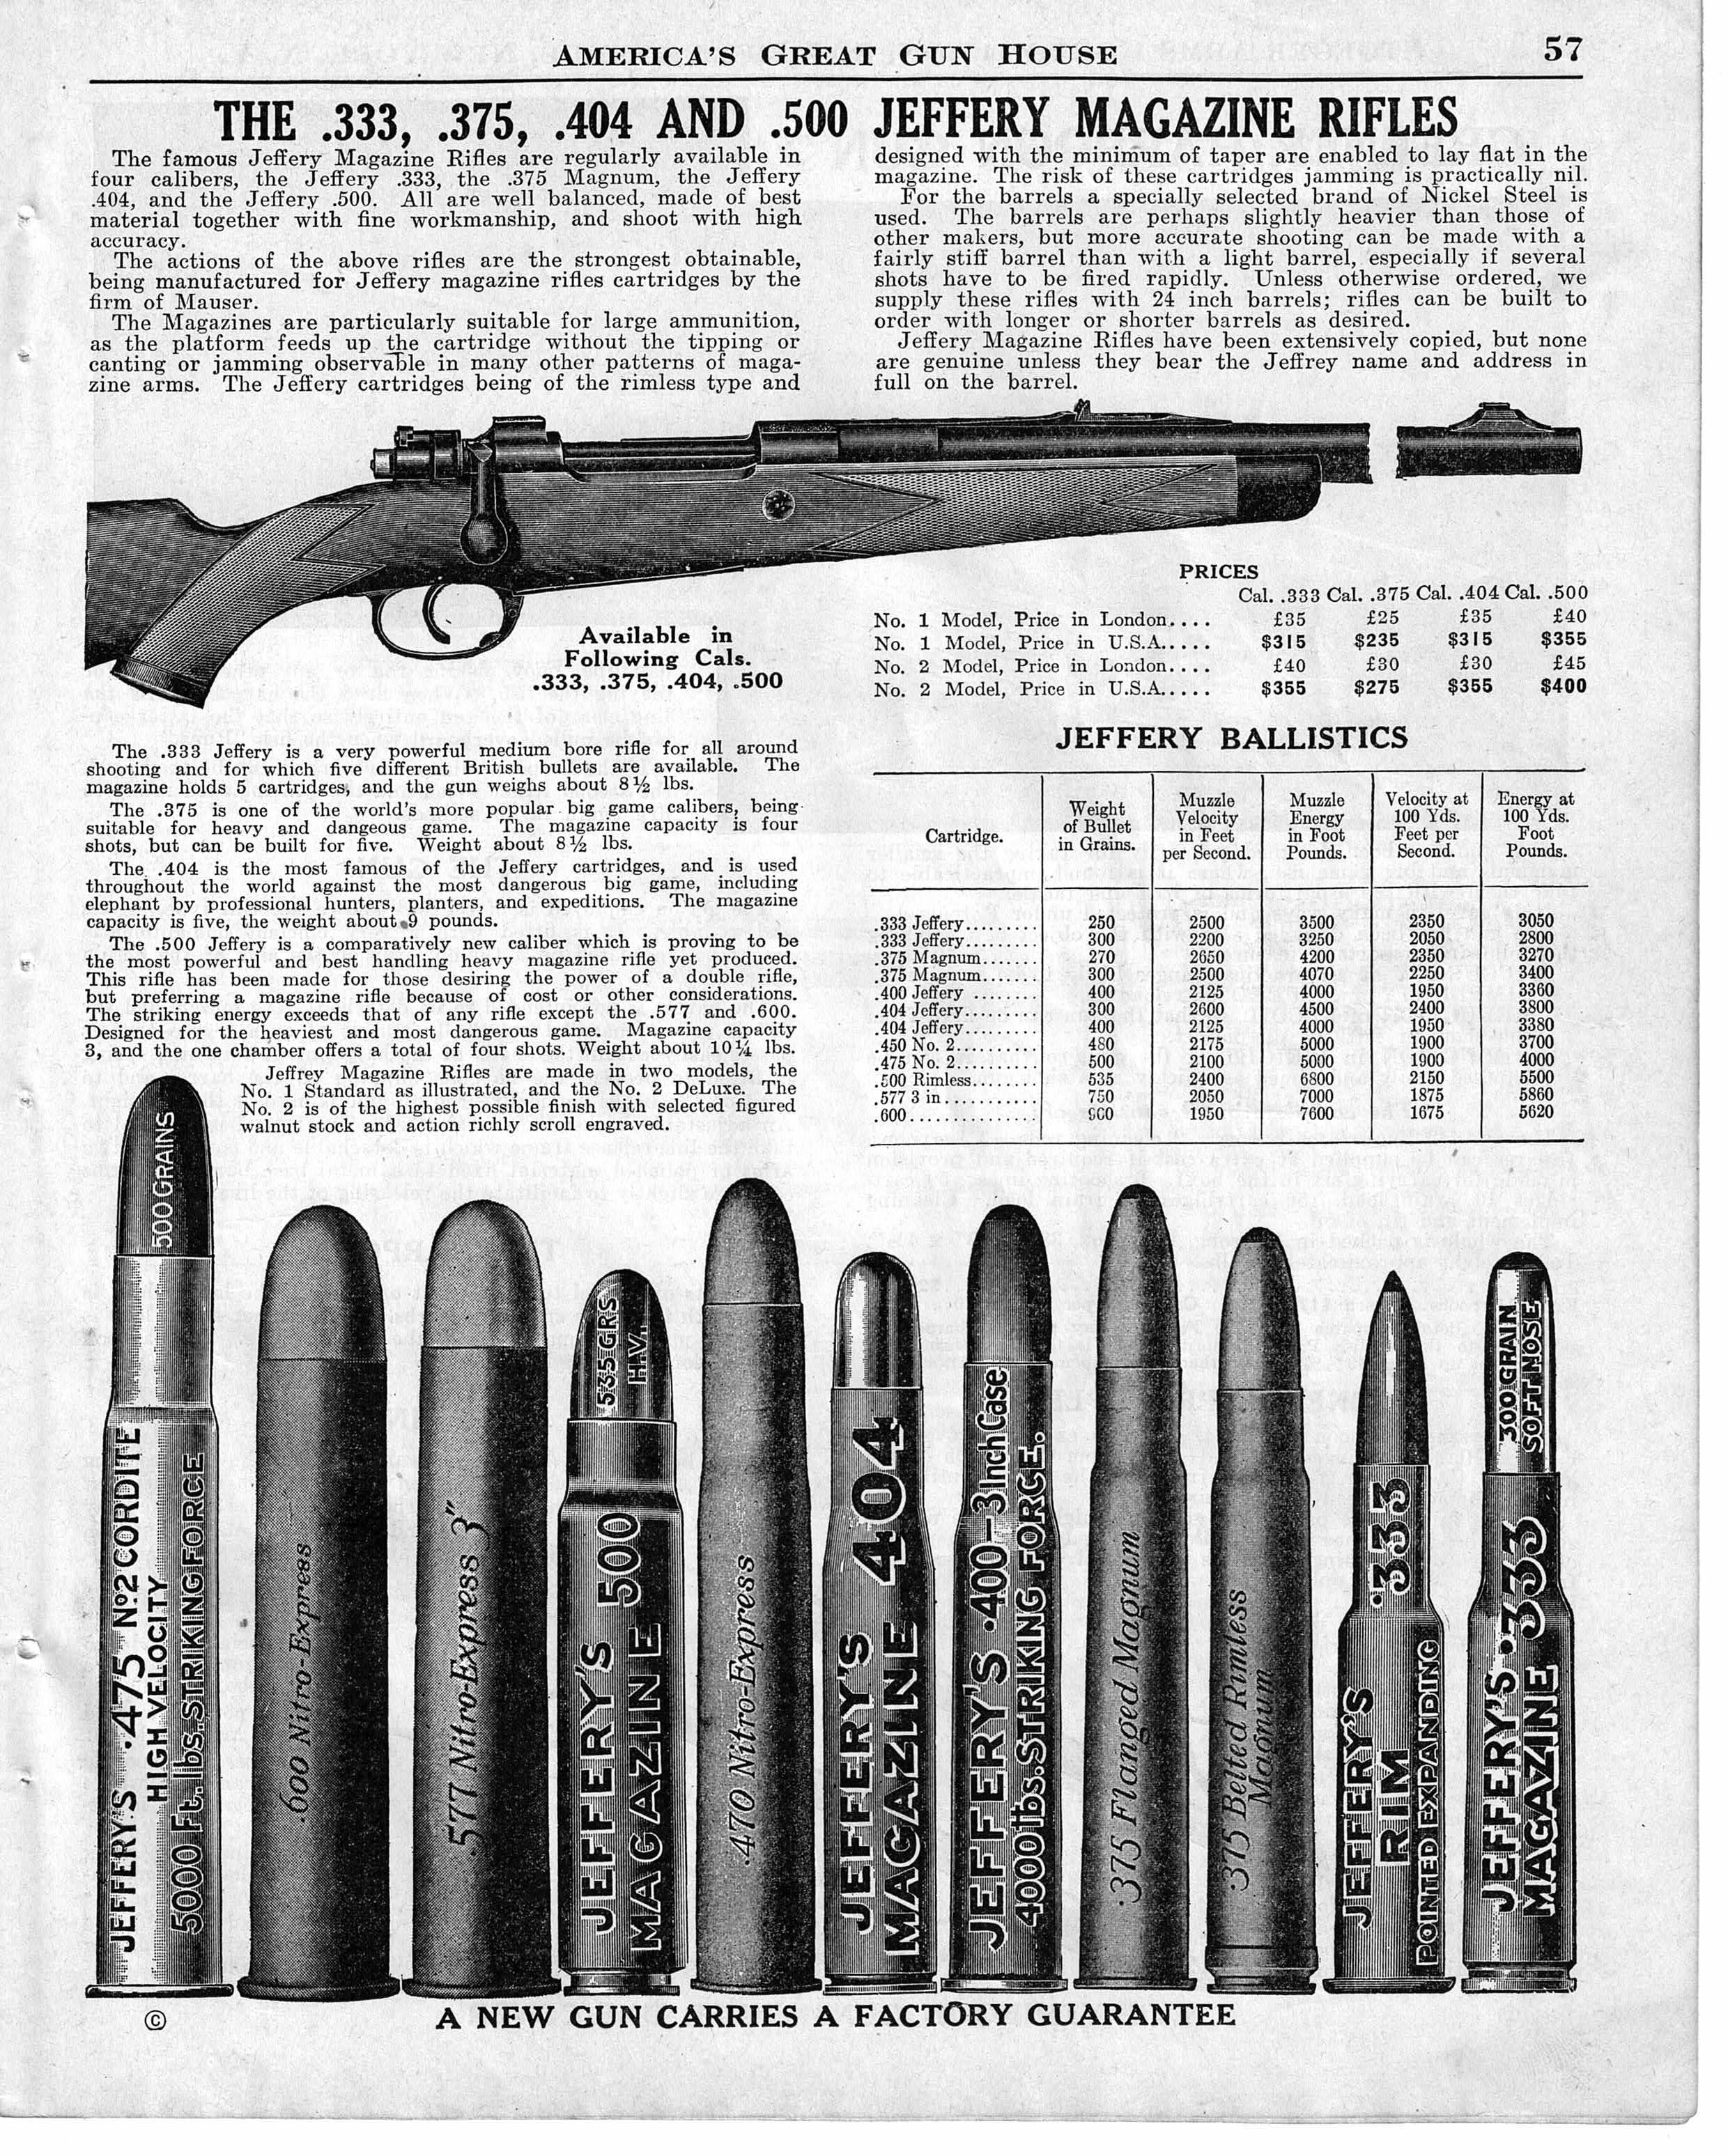 Jeffery Magazine Rifles ST39 Page 57 001.jpg